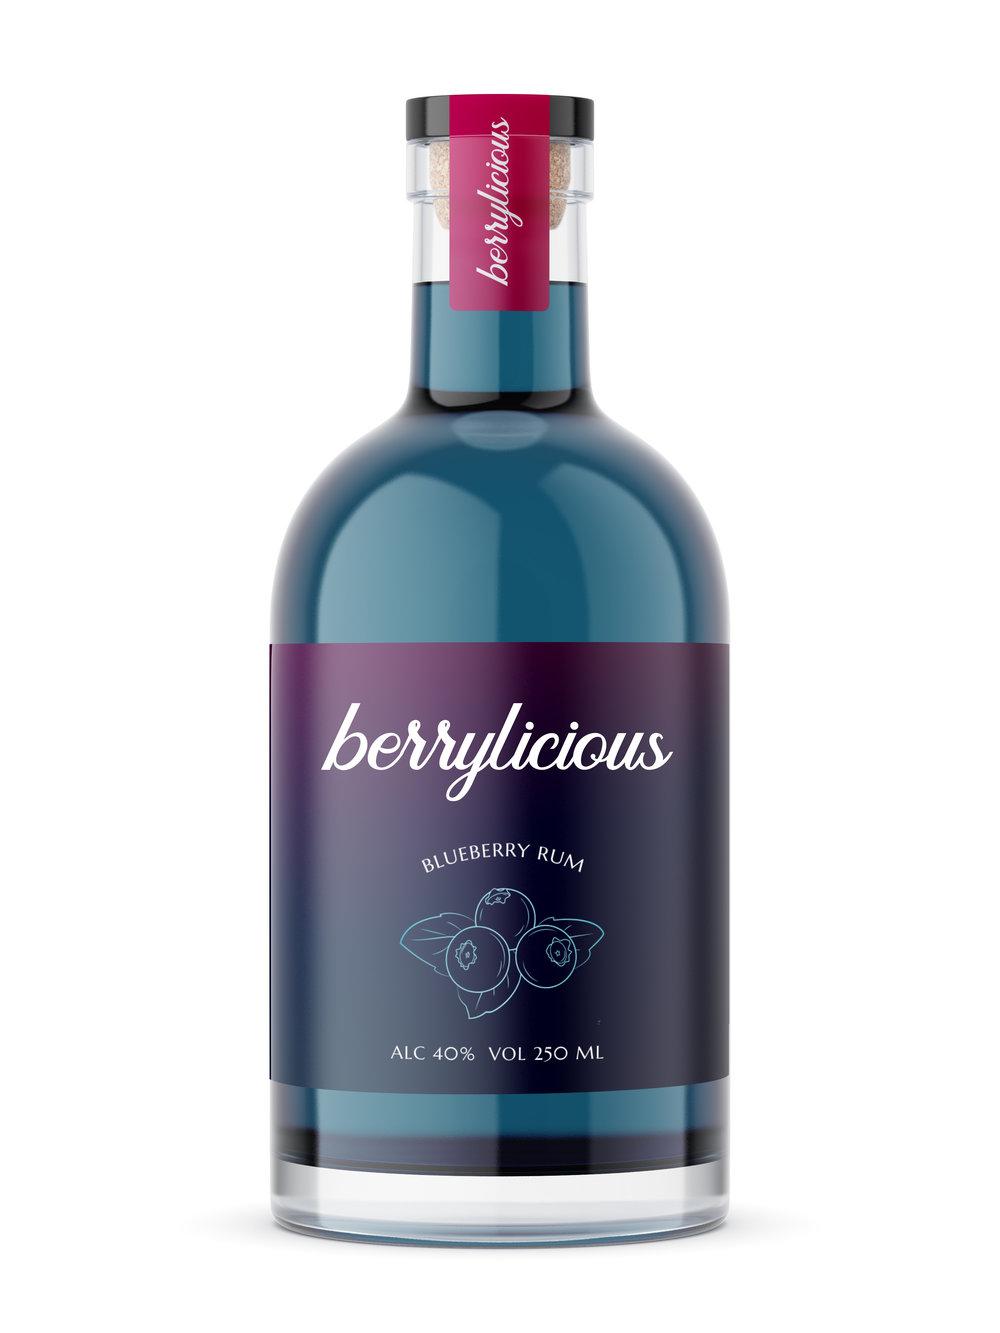 Berrylicious Blueberry Rum